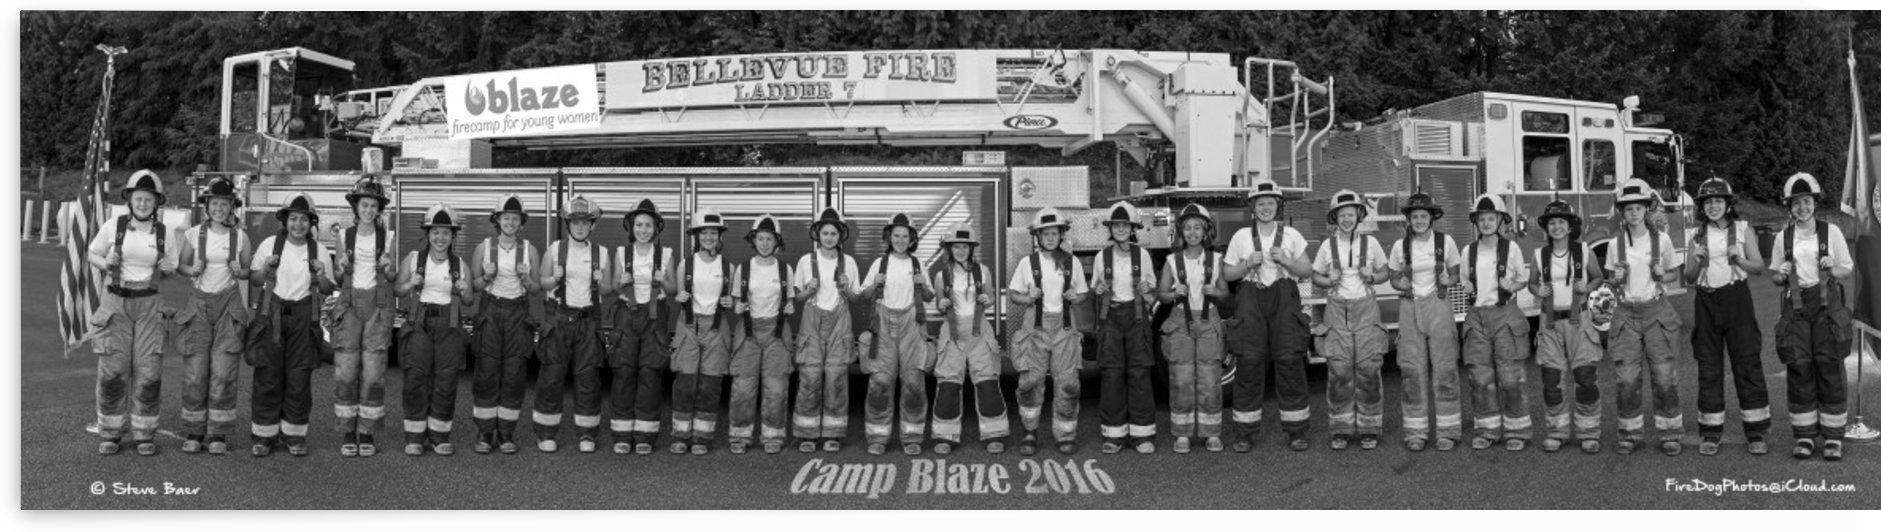 Camp Blaze Campers B/W by Steve